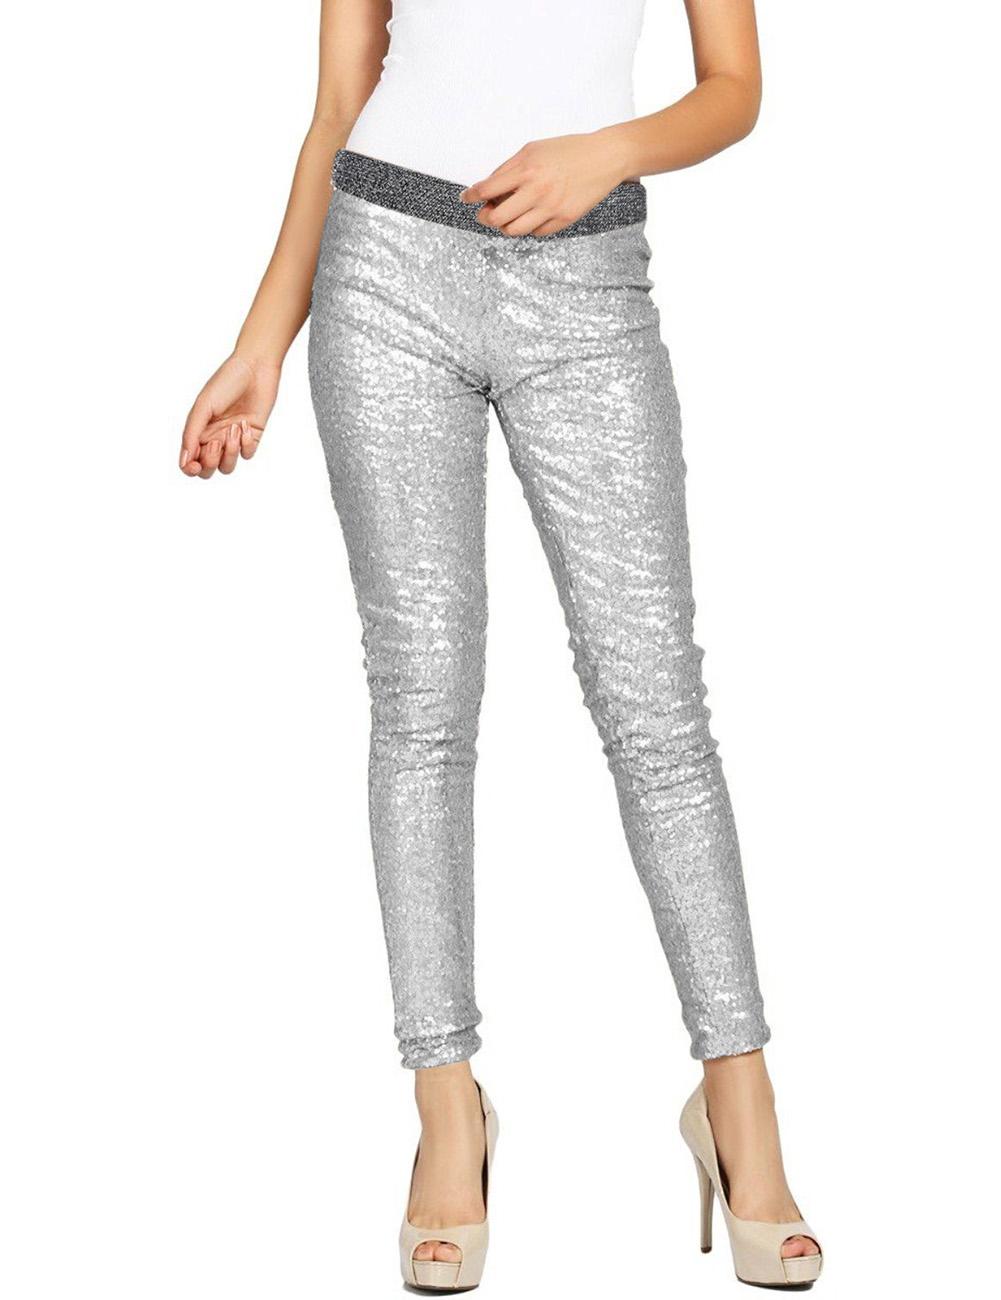 women 39 s rockabilly sequins skinny leggings pants winter glitter pencil jeggings ebay. Black Bedroom Furniture Sets. Home Design Ideas